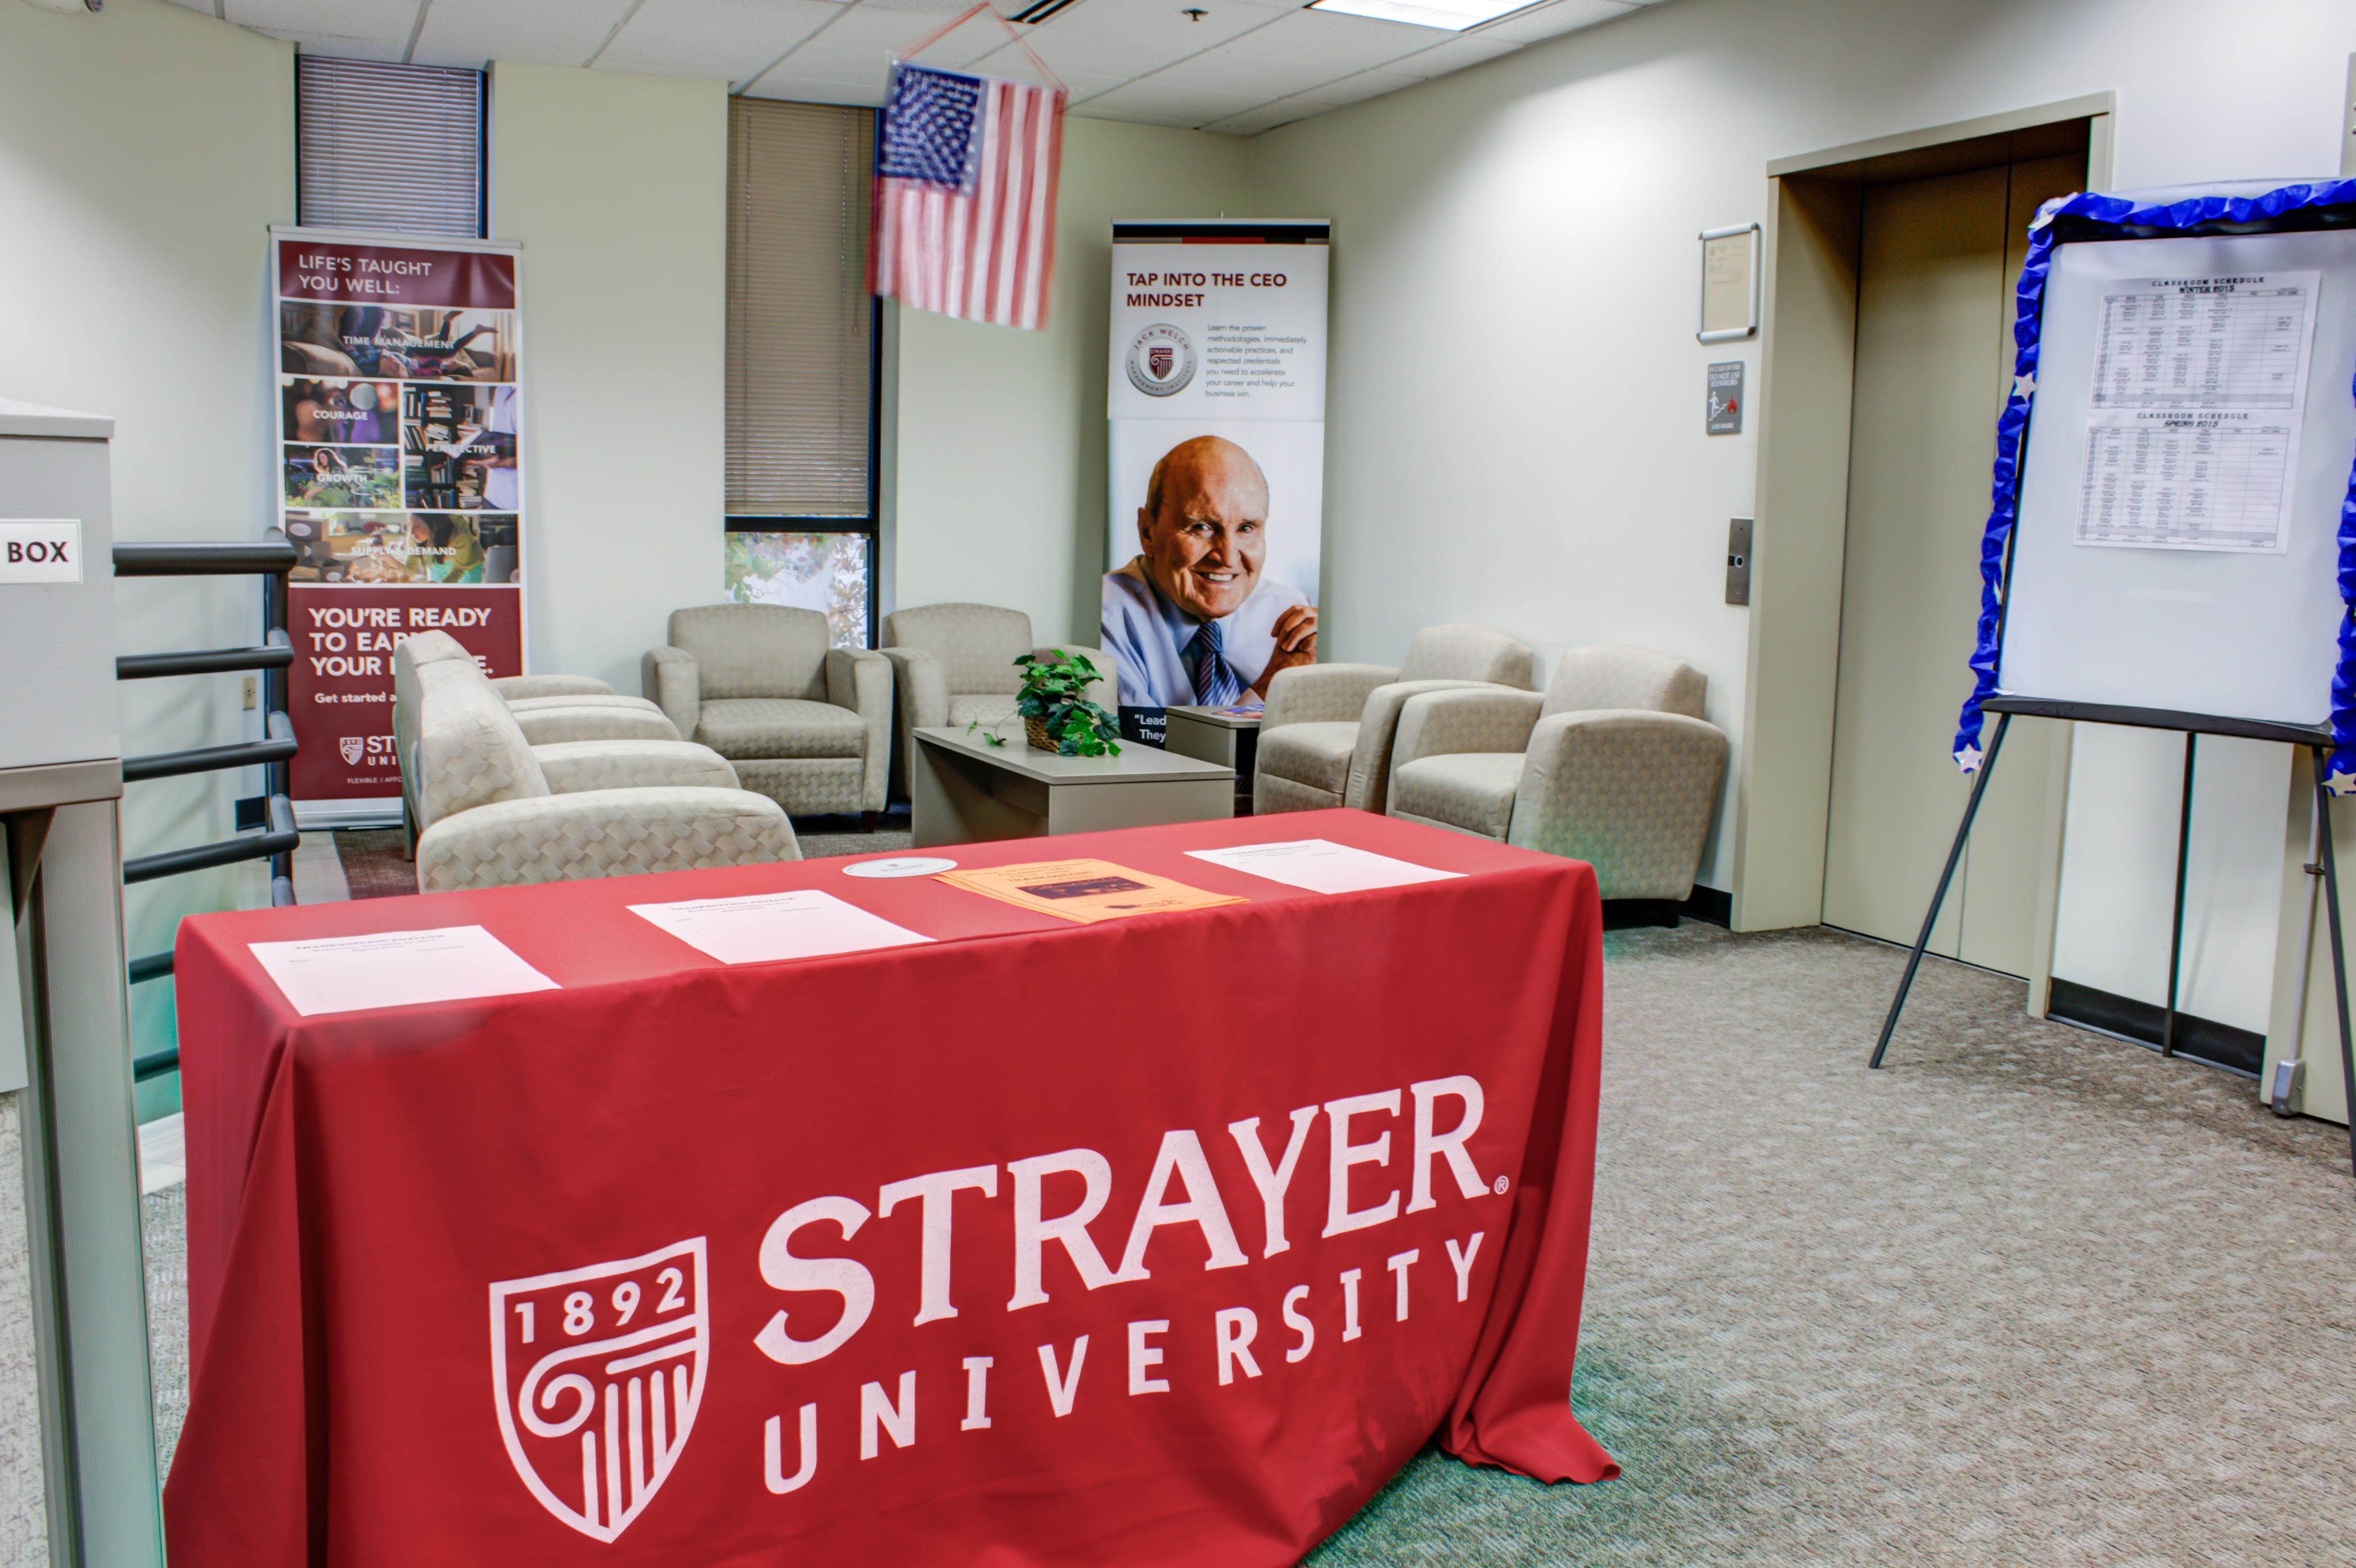 Strayer University image 22